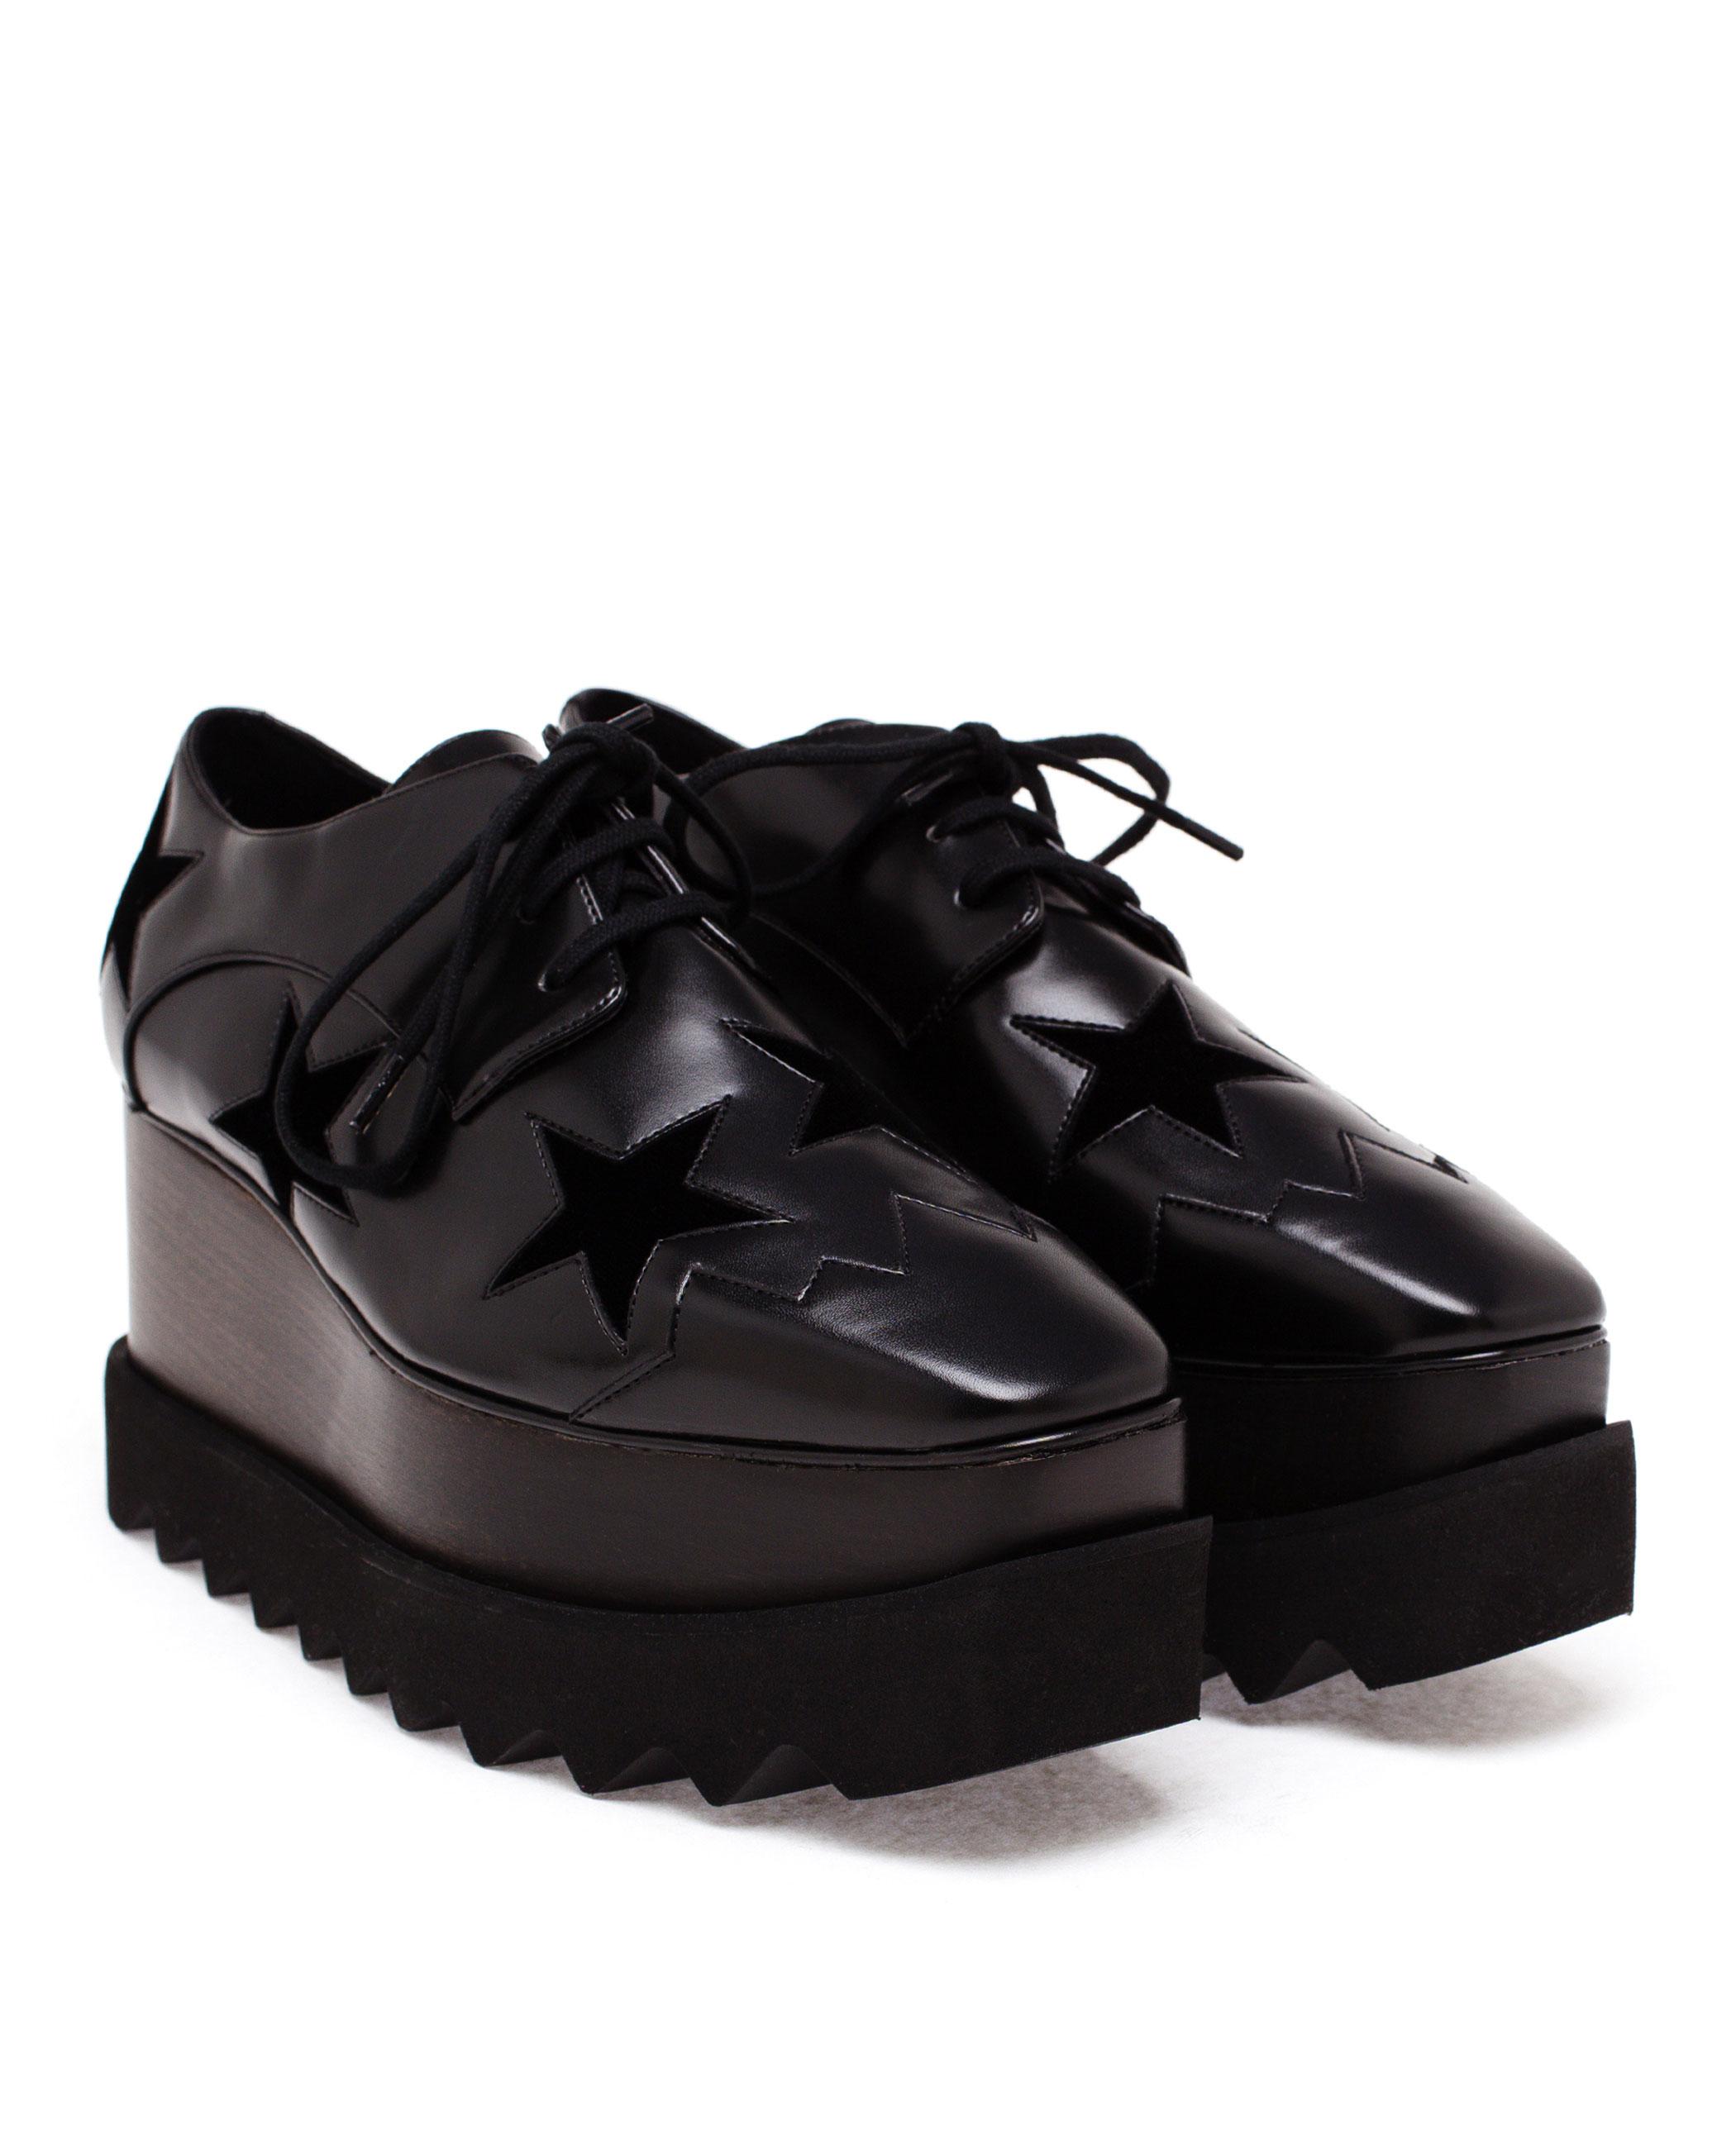 Black Elyse Brushed Star Shoes